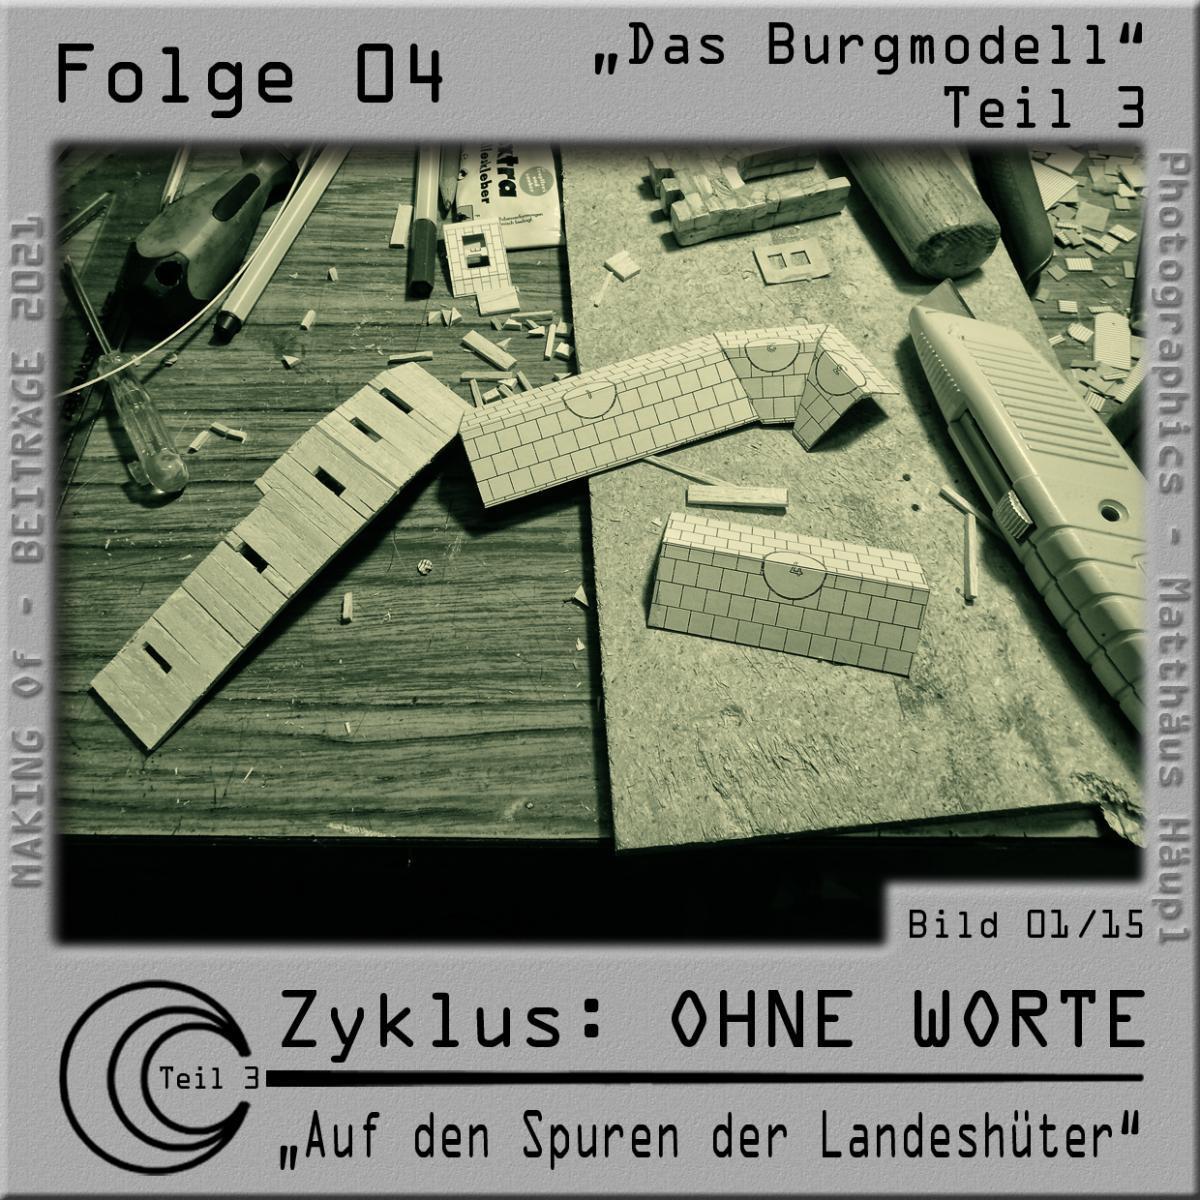 Folge-04 Das-Burgmodell Teil-3-01